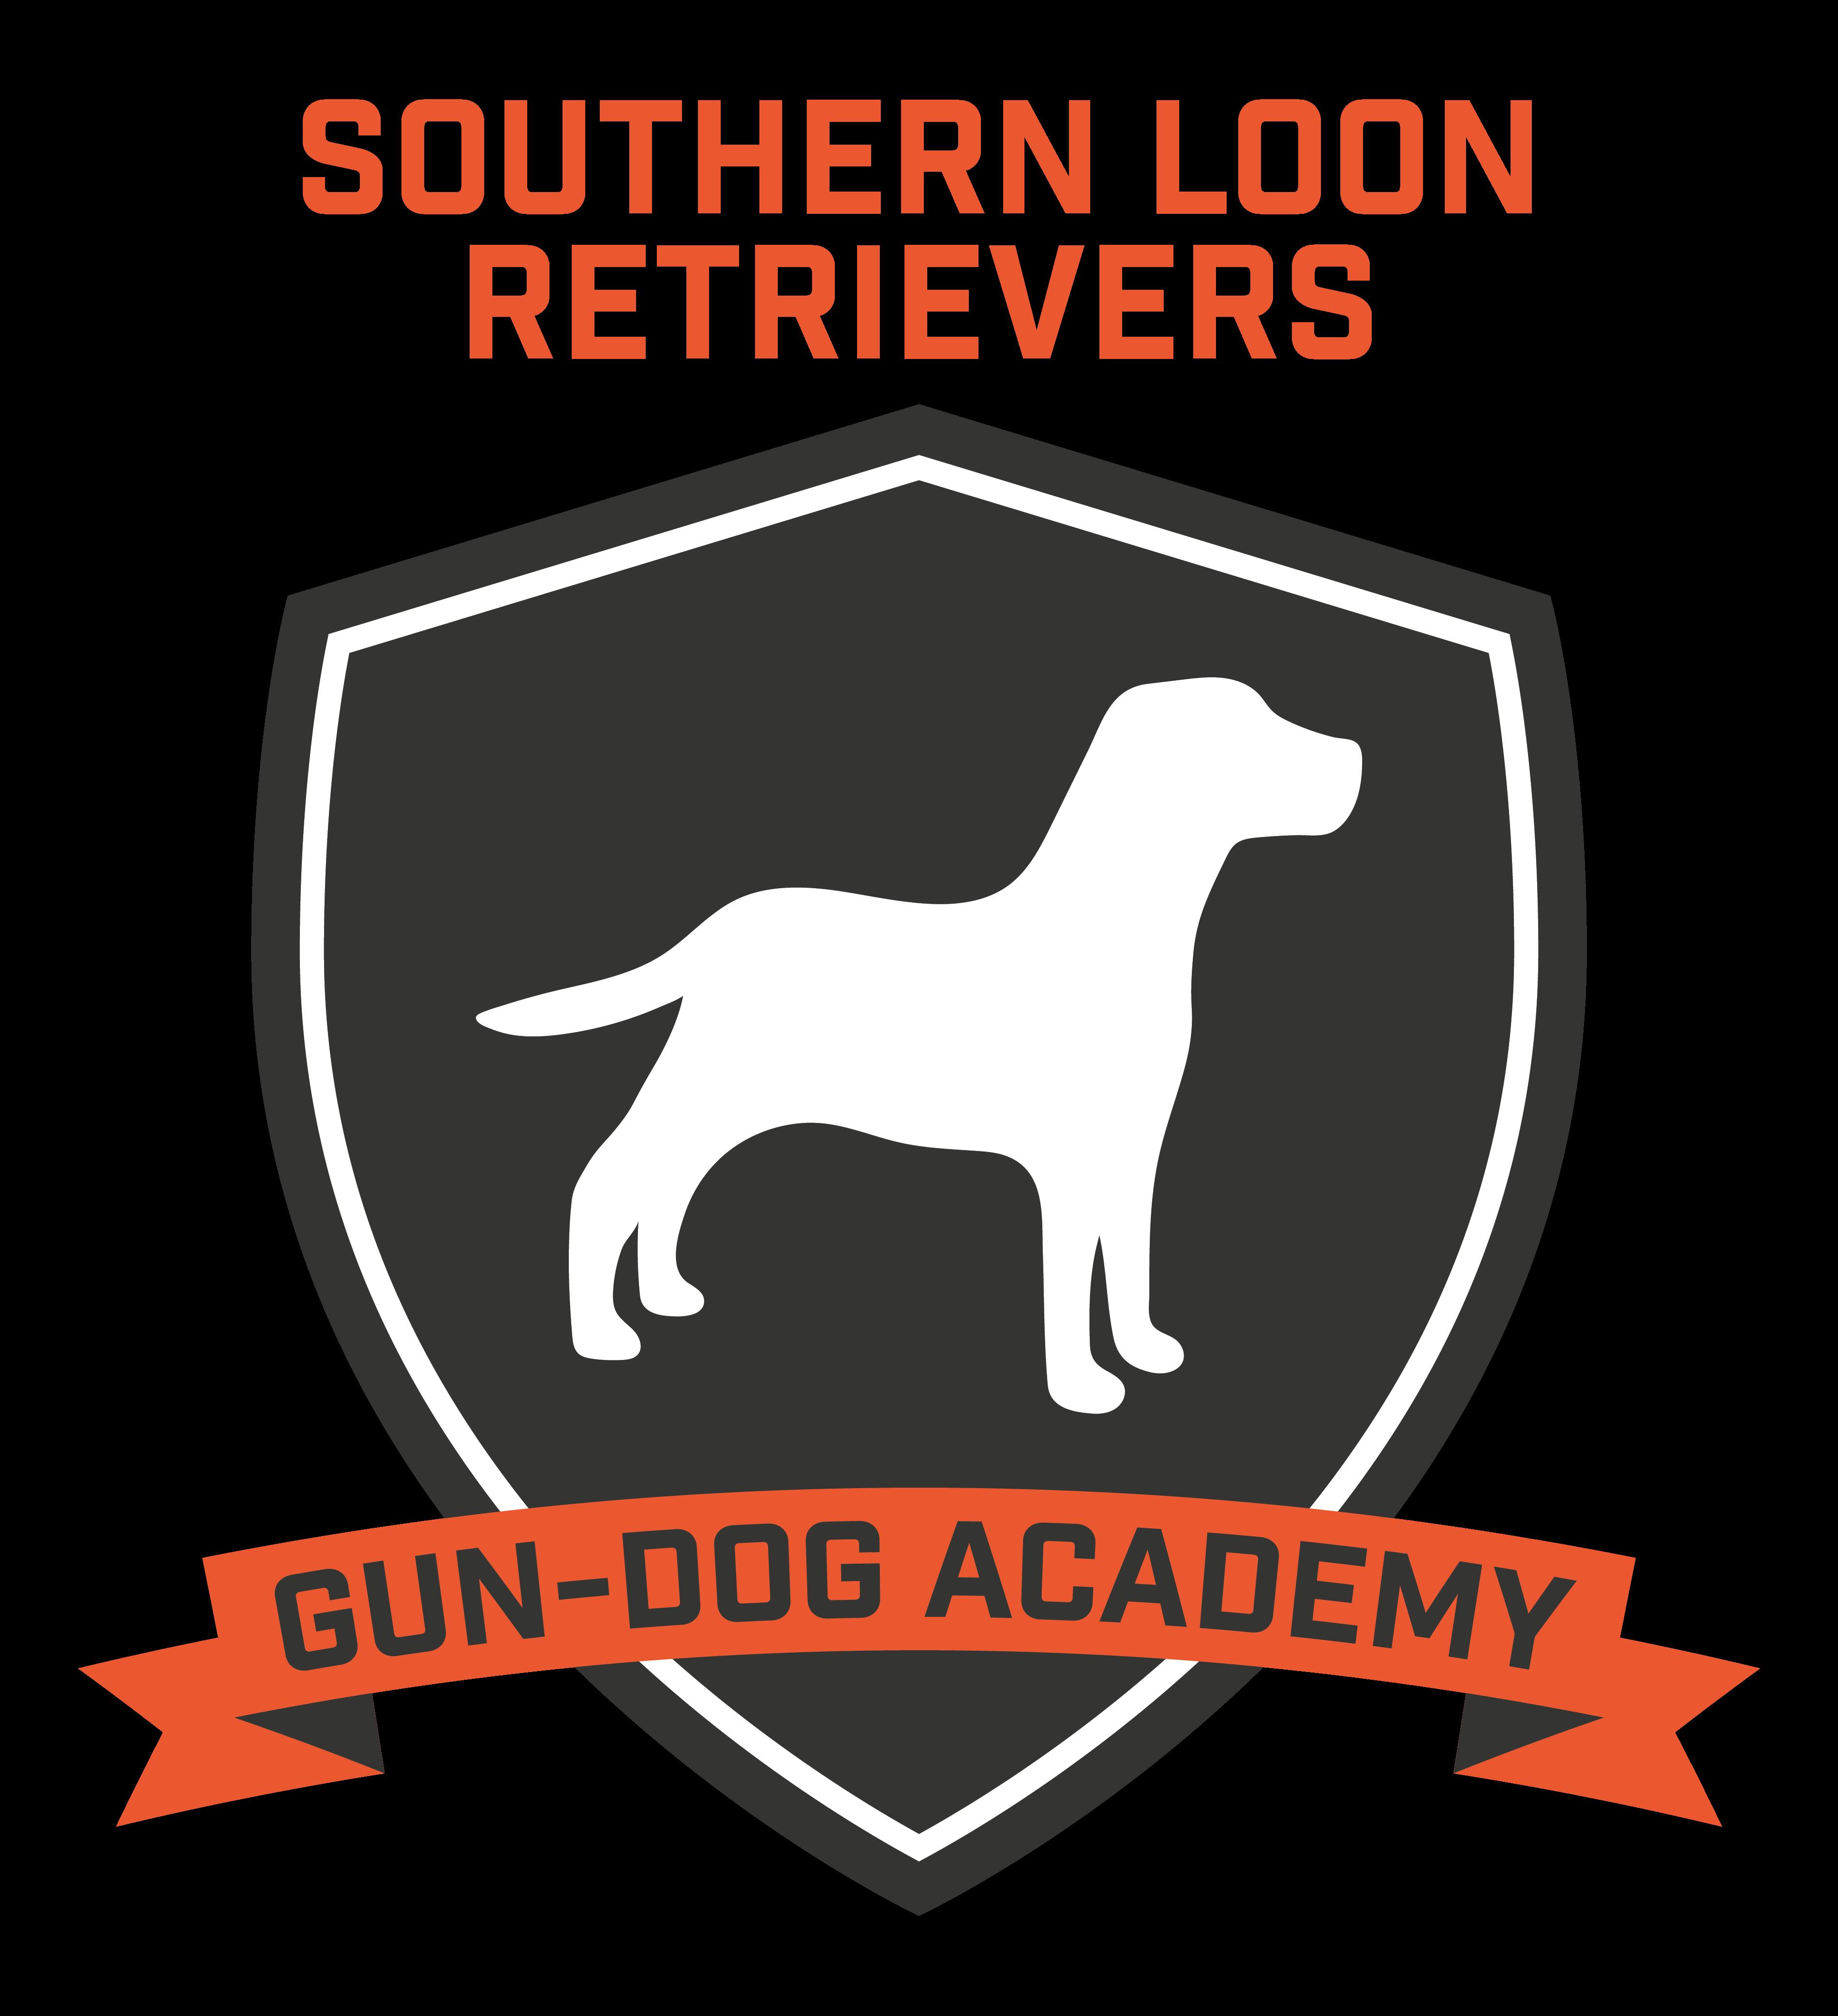 Southern Loon Gun-Dog Logo